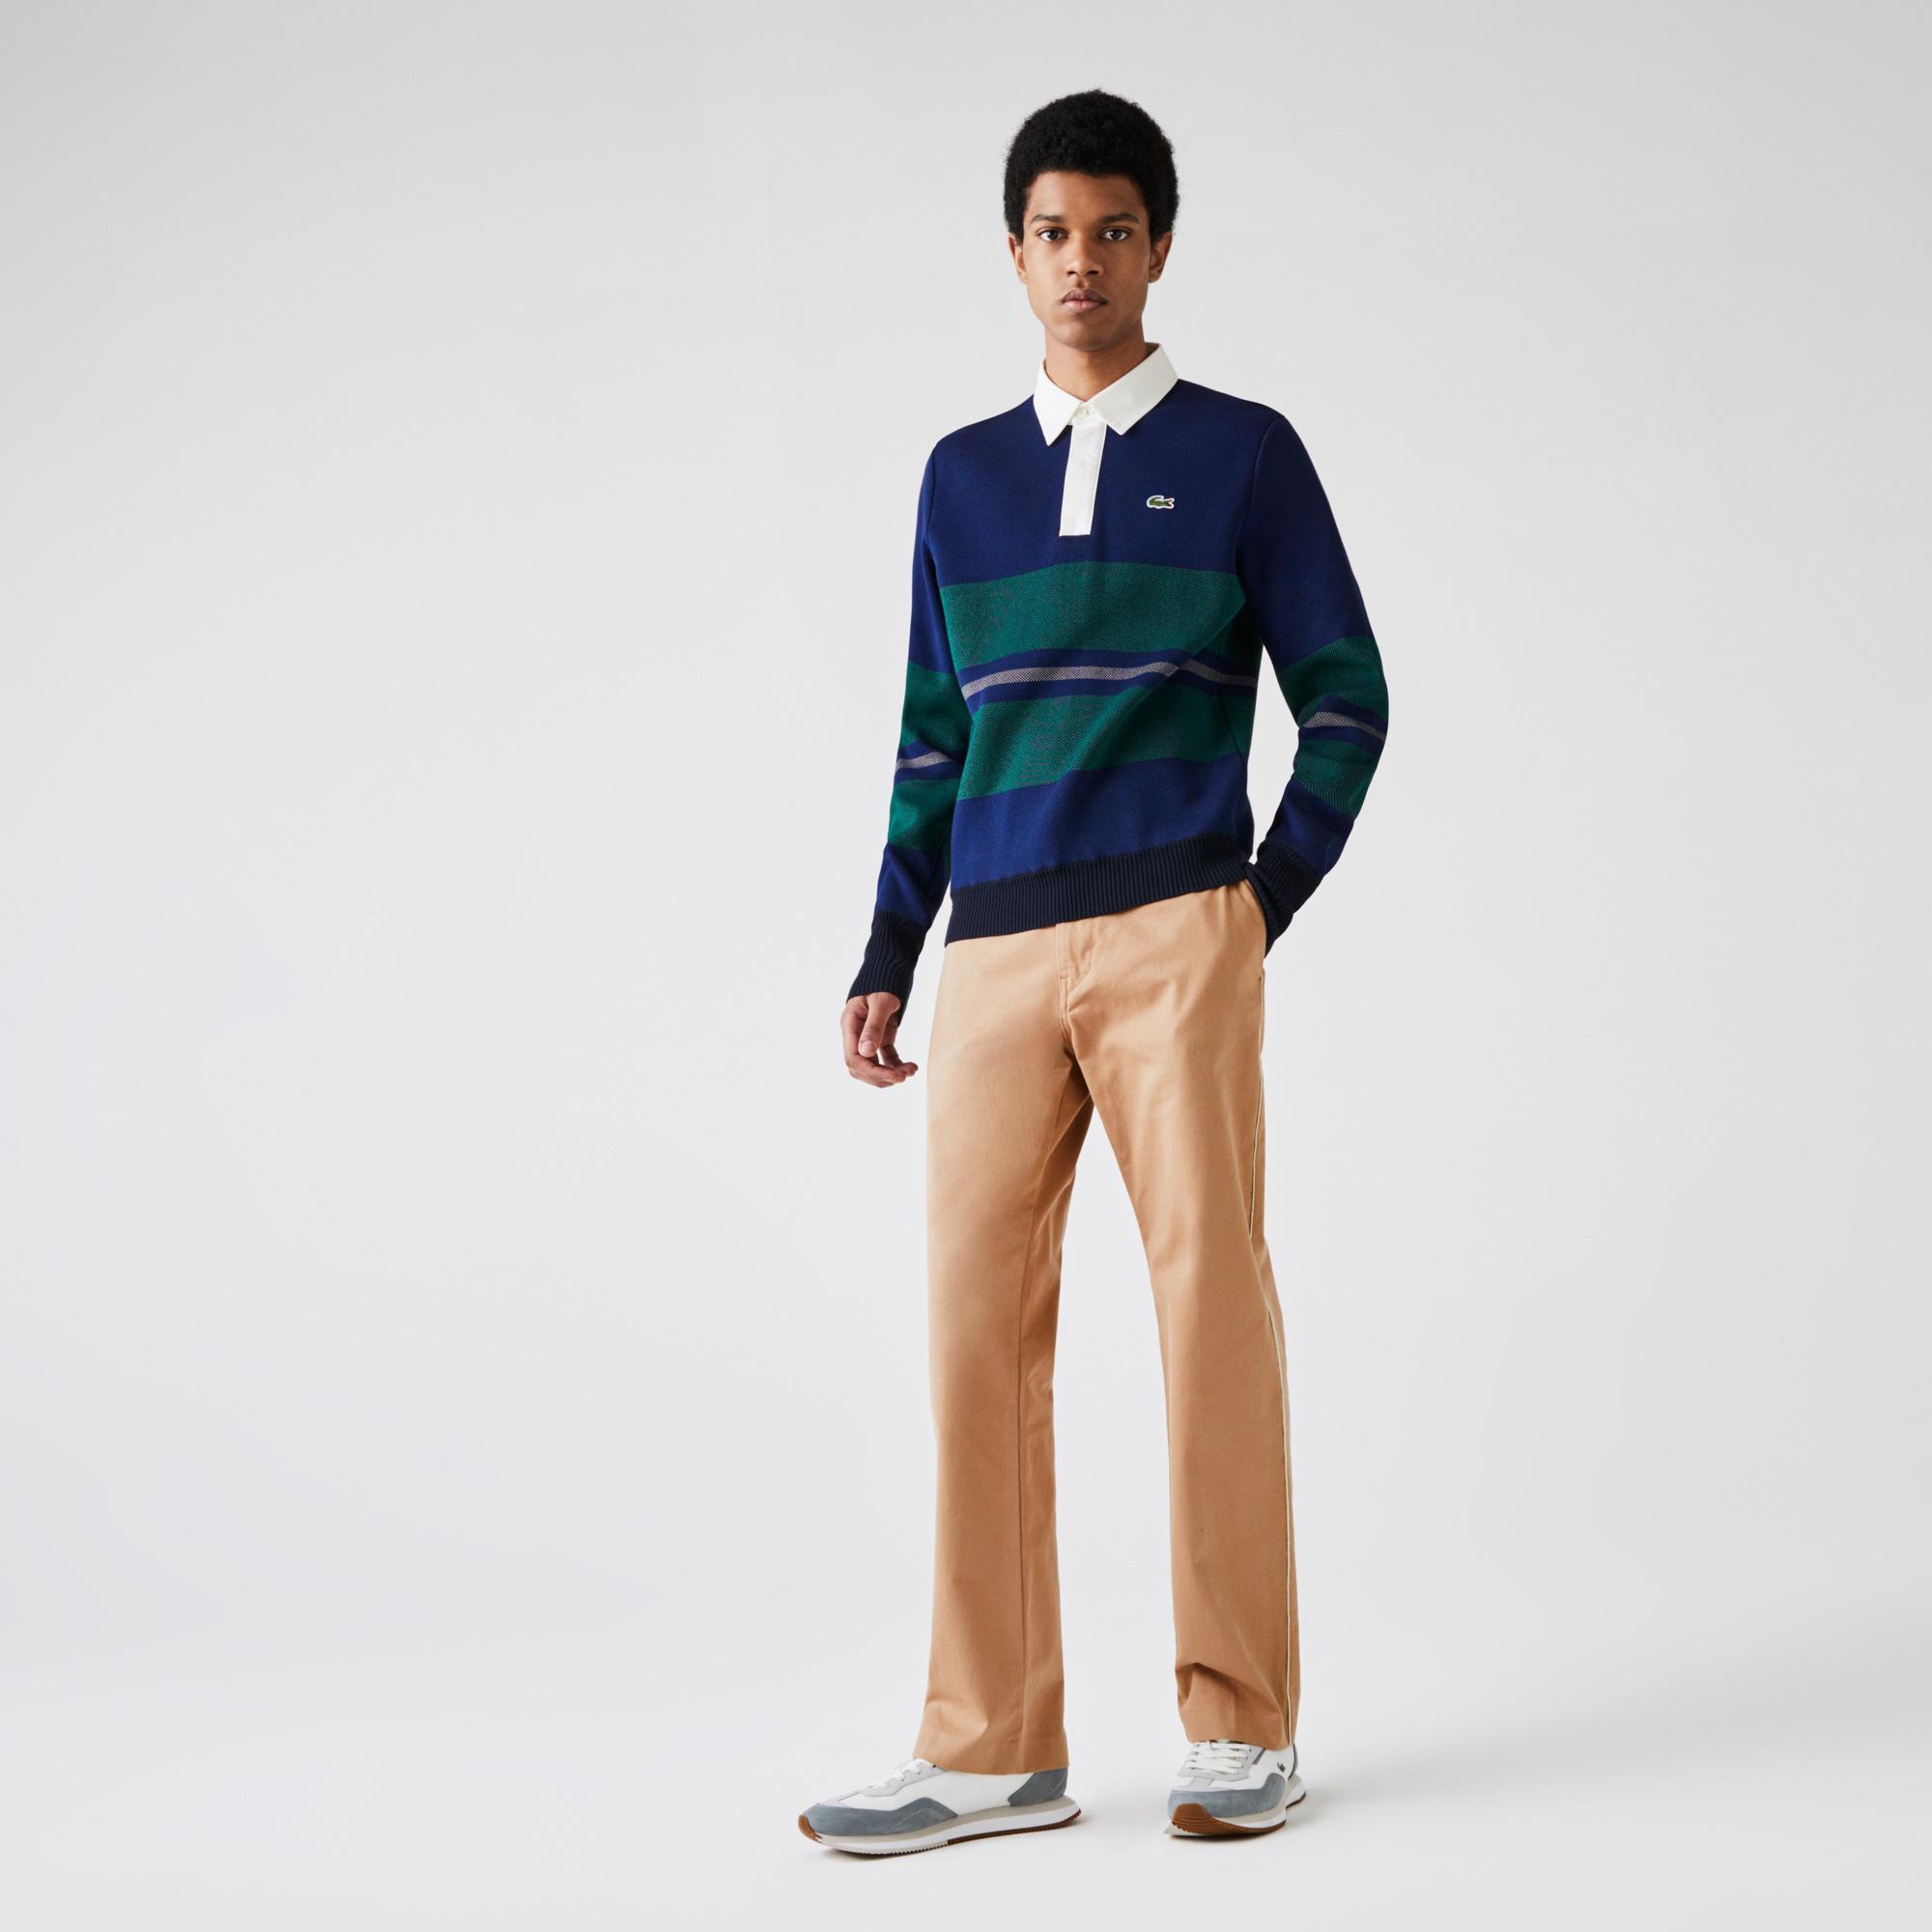 Lacoste L!VE Męskie spodnie typu chino z pięcioma kieszeniami